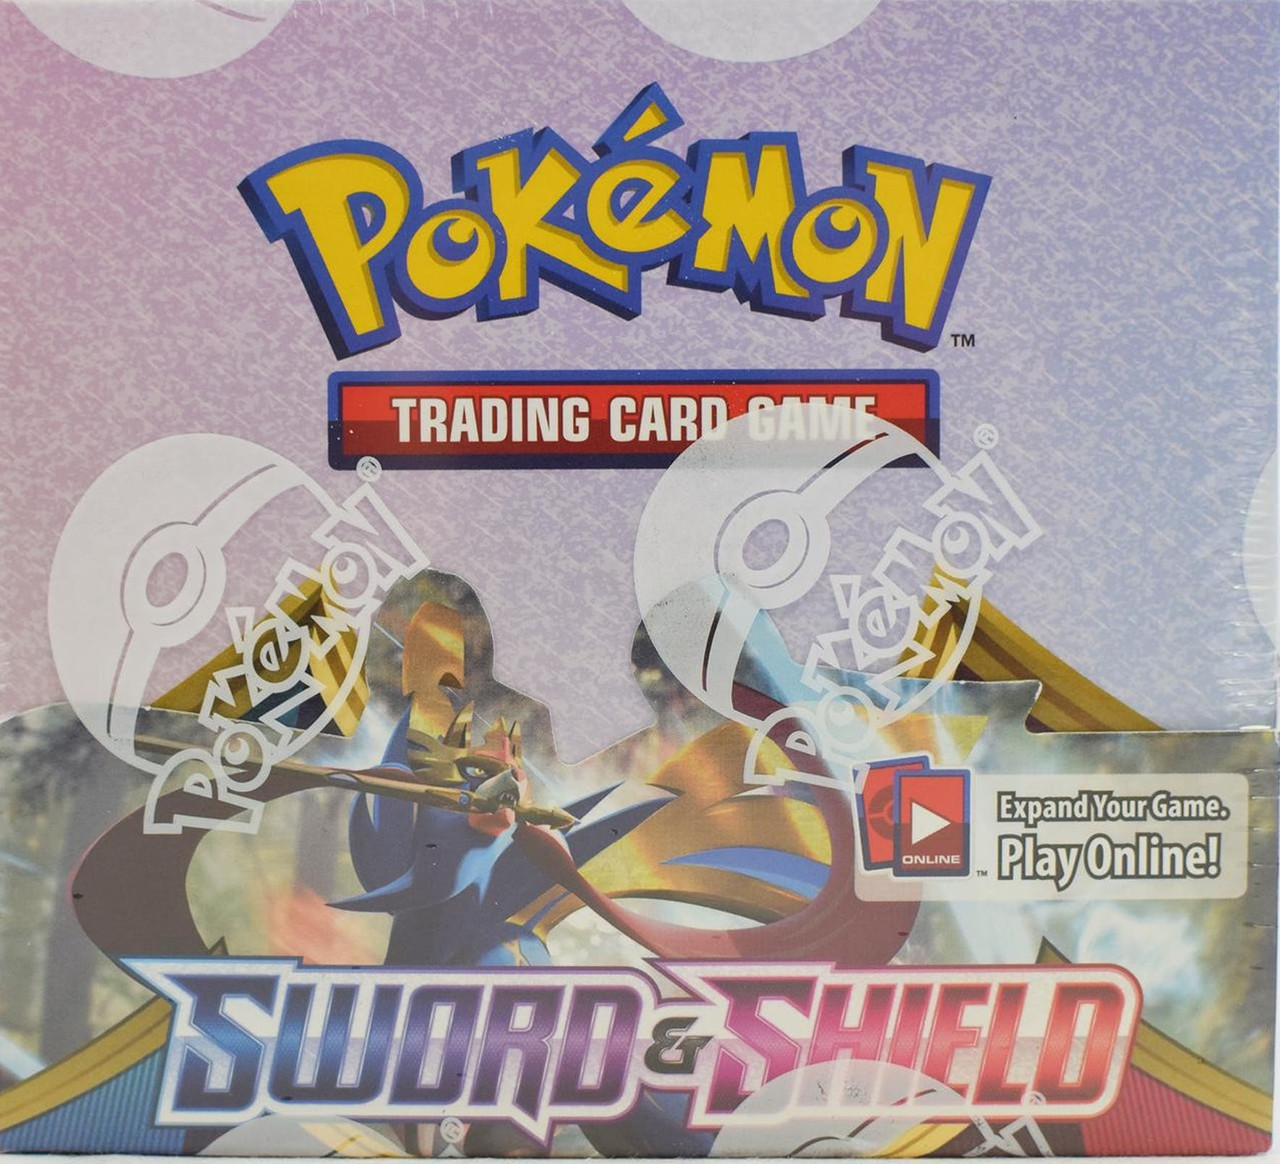 Pokemon Sword & Shield Booster Box - BP Sports Cards and Memorabilia, Inc.